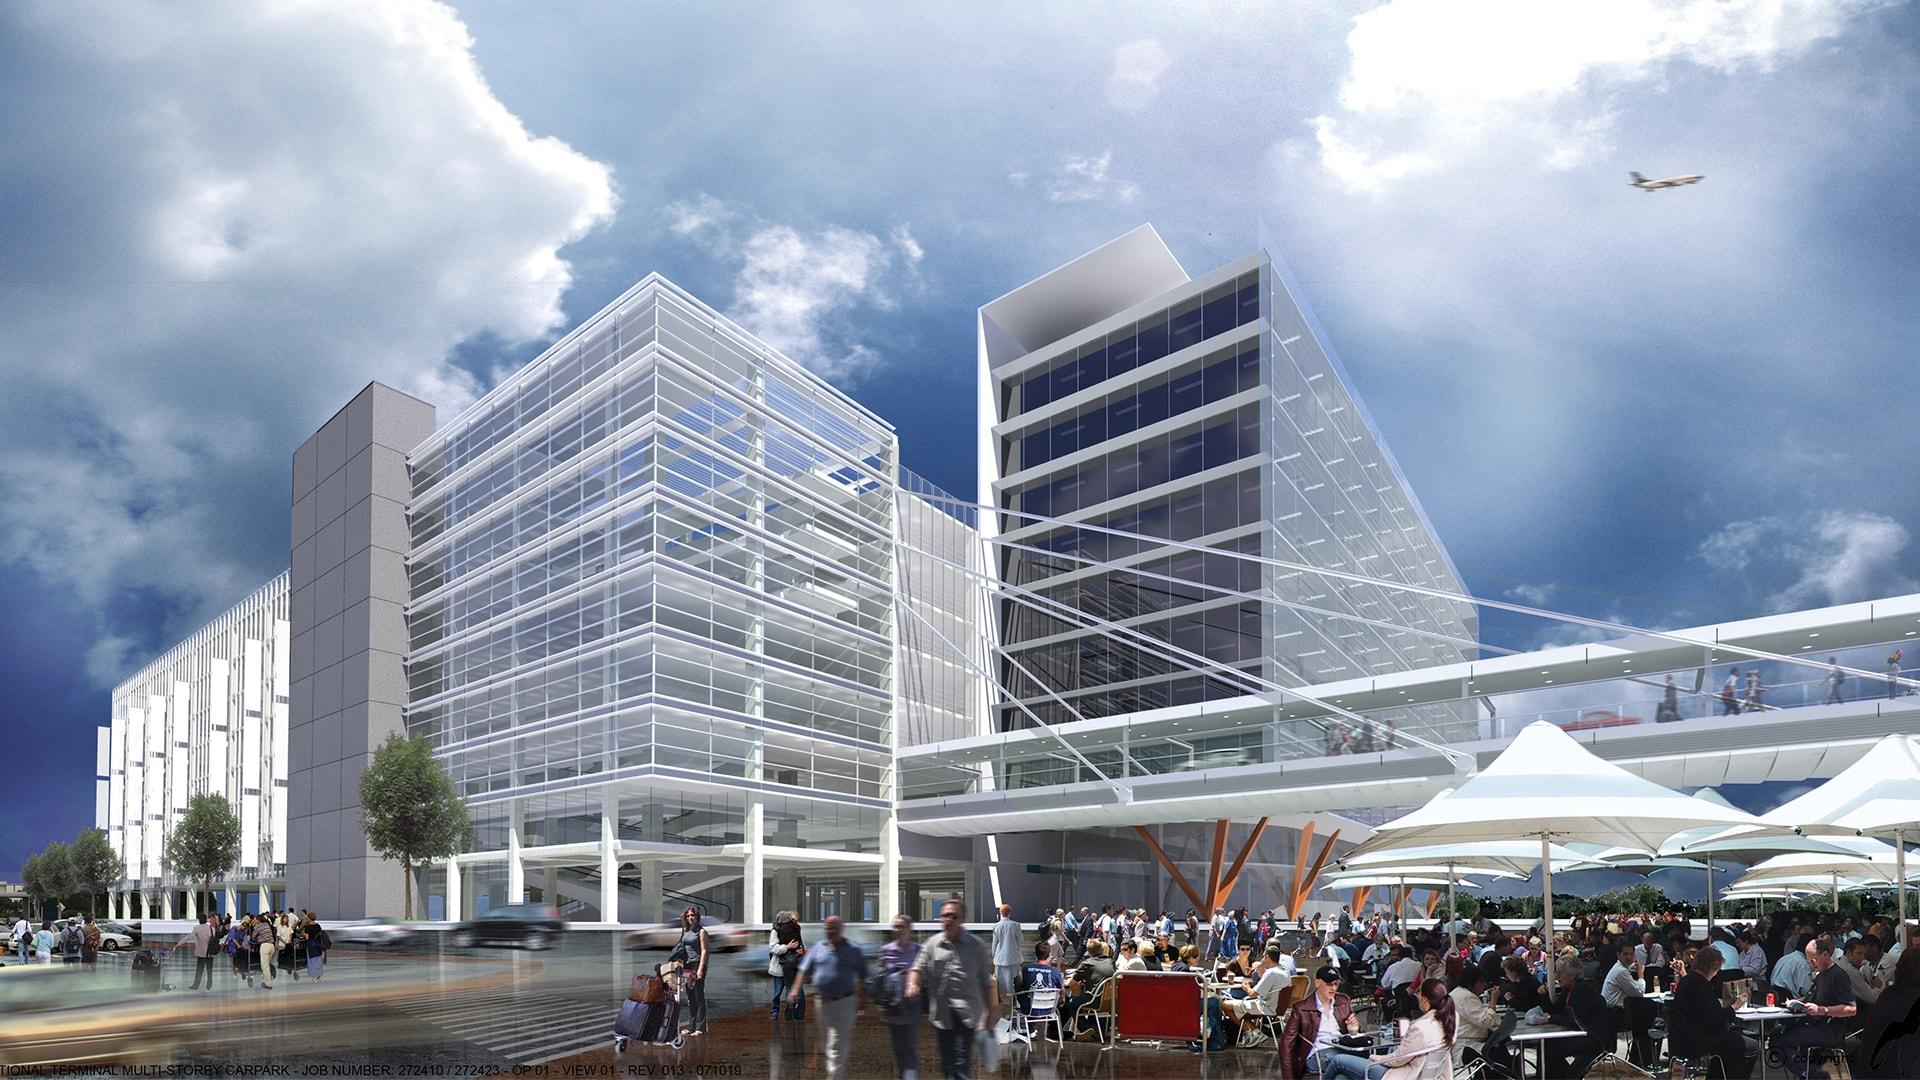 sydney-international-airport-car-park-main-image-min